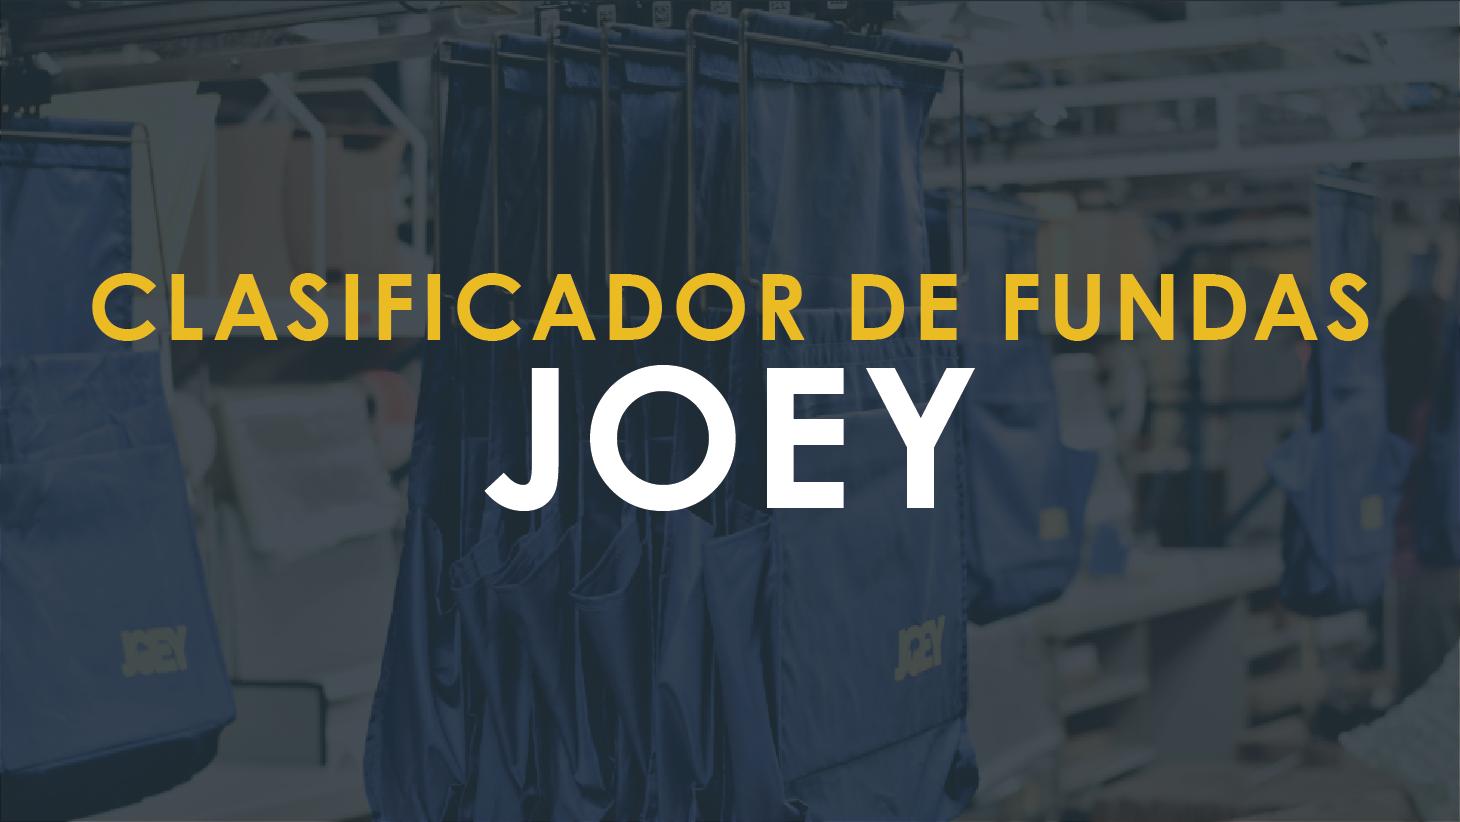 JOEY-icon_1